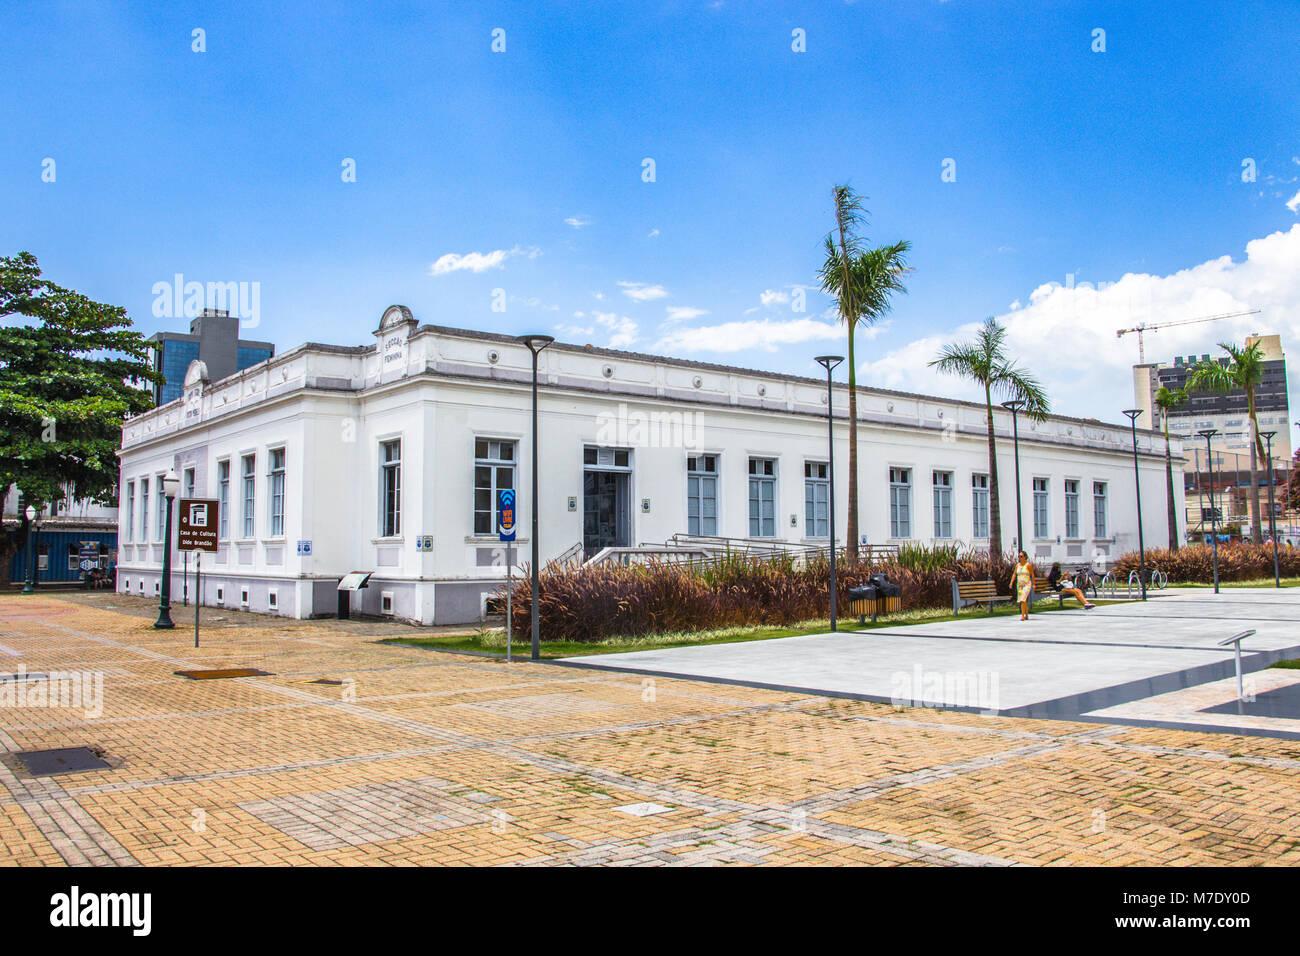 Itajai, Santa Catarina, Brazil - February 22th, 2018: The Casa de Cultura Dide Brandao at the downtown of Itajai, - Stock Image